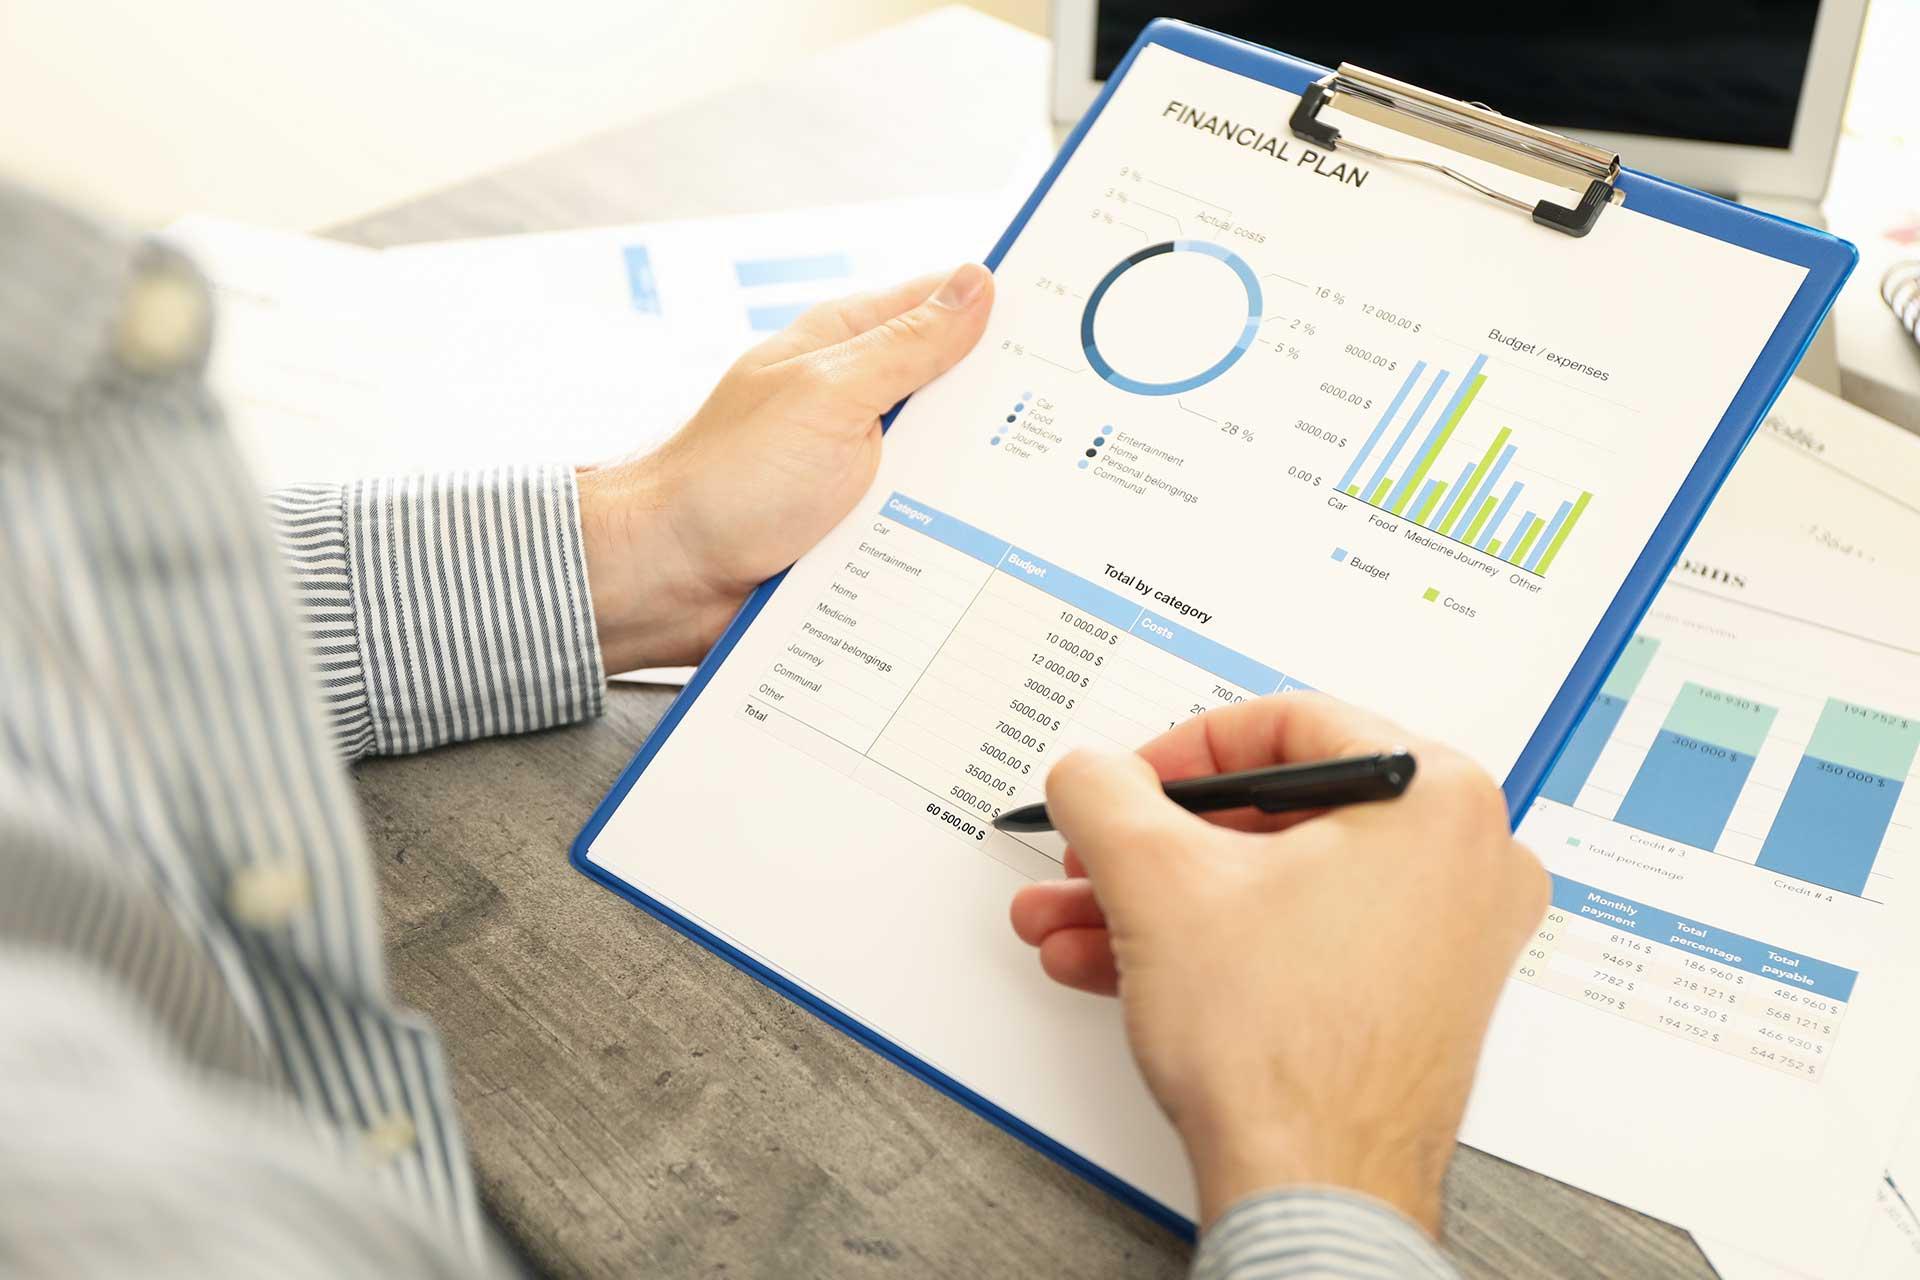 http://digitus-accountancy.com/wp-content/uploads/2021/06/financial-plan.jpg